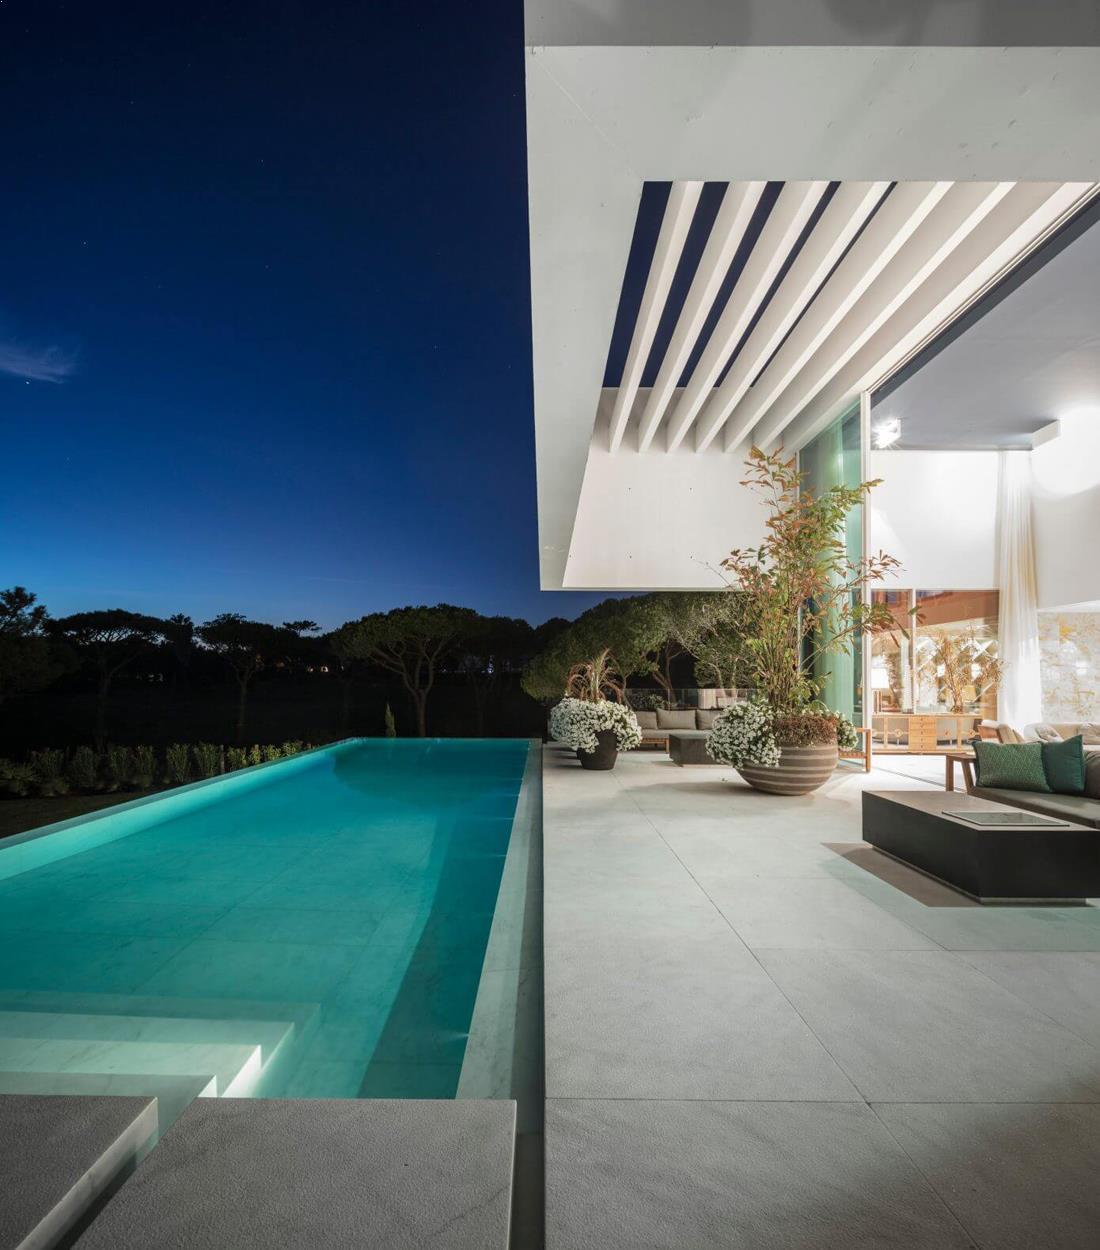 Hoover_casa_alba_piscina